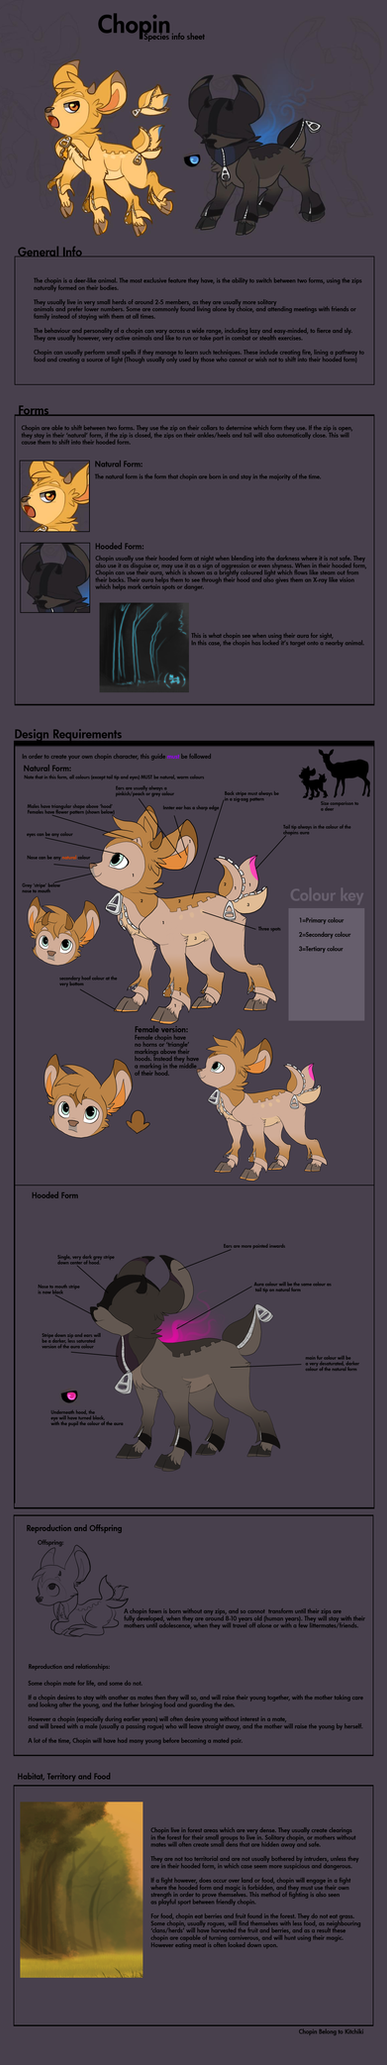 Chopin Species info sheet -Open Species- by Kitchiki